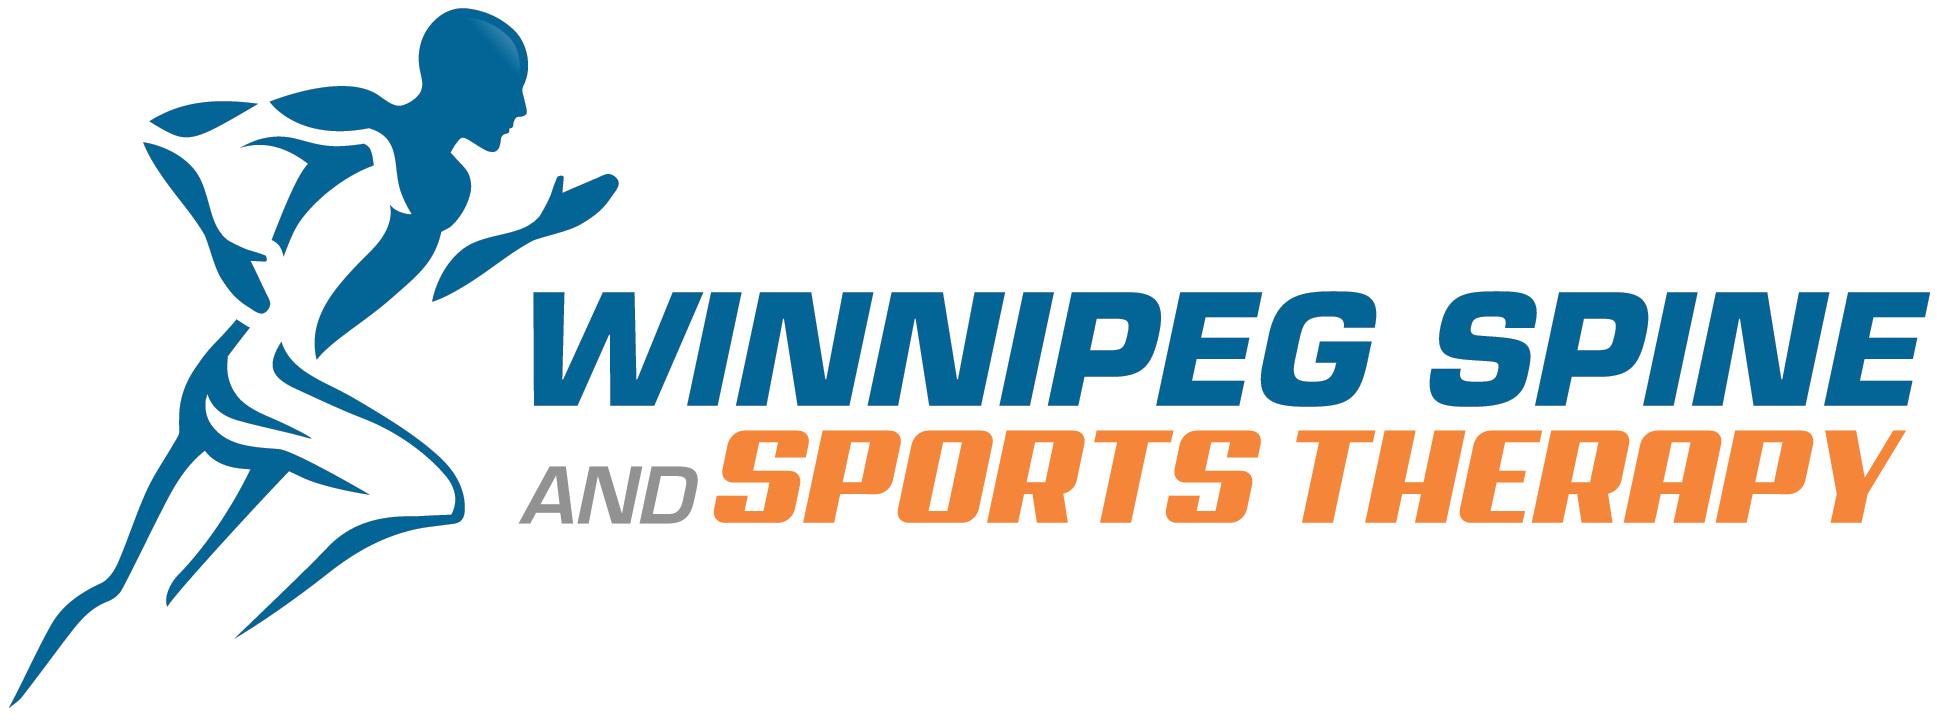 Winnipeg Spine